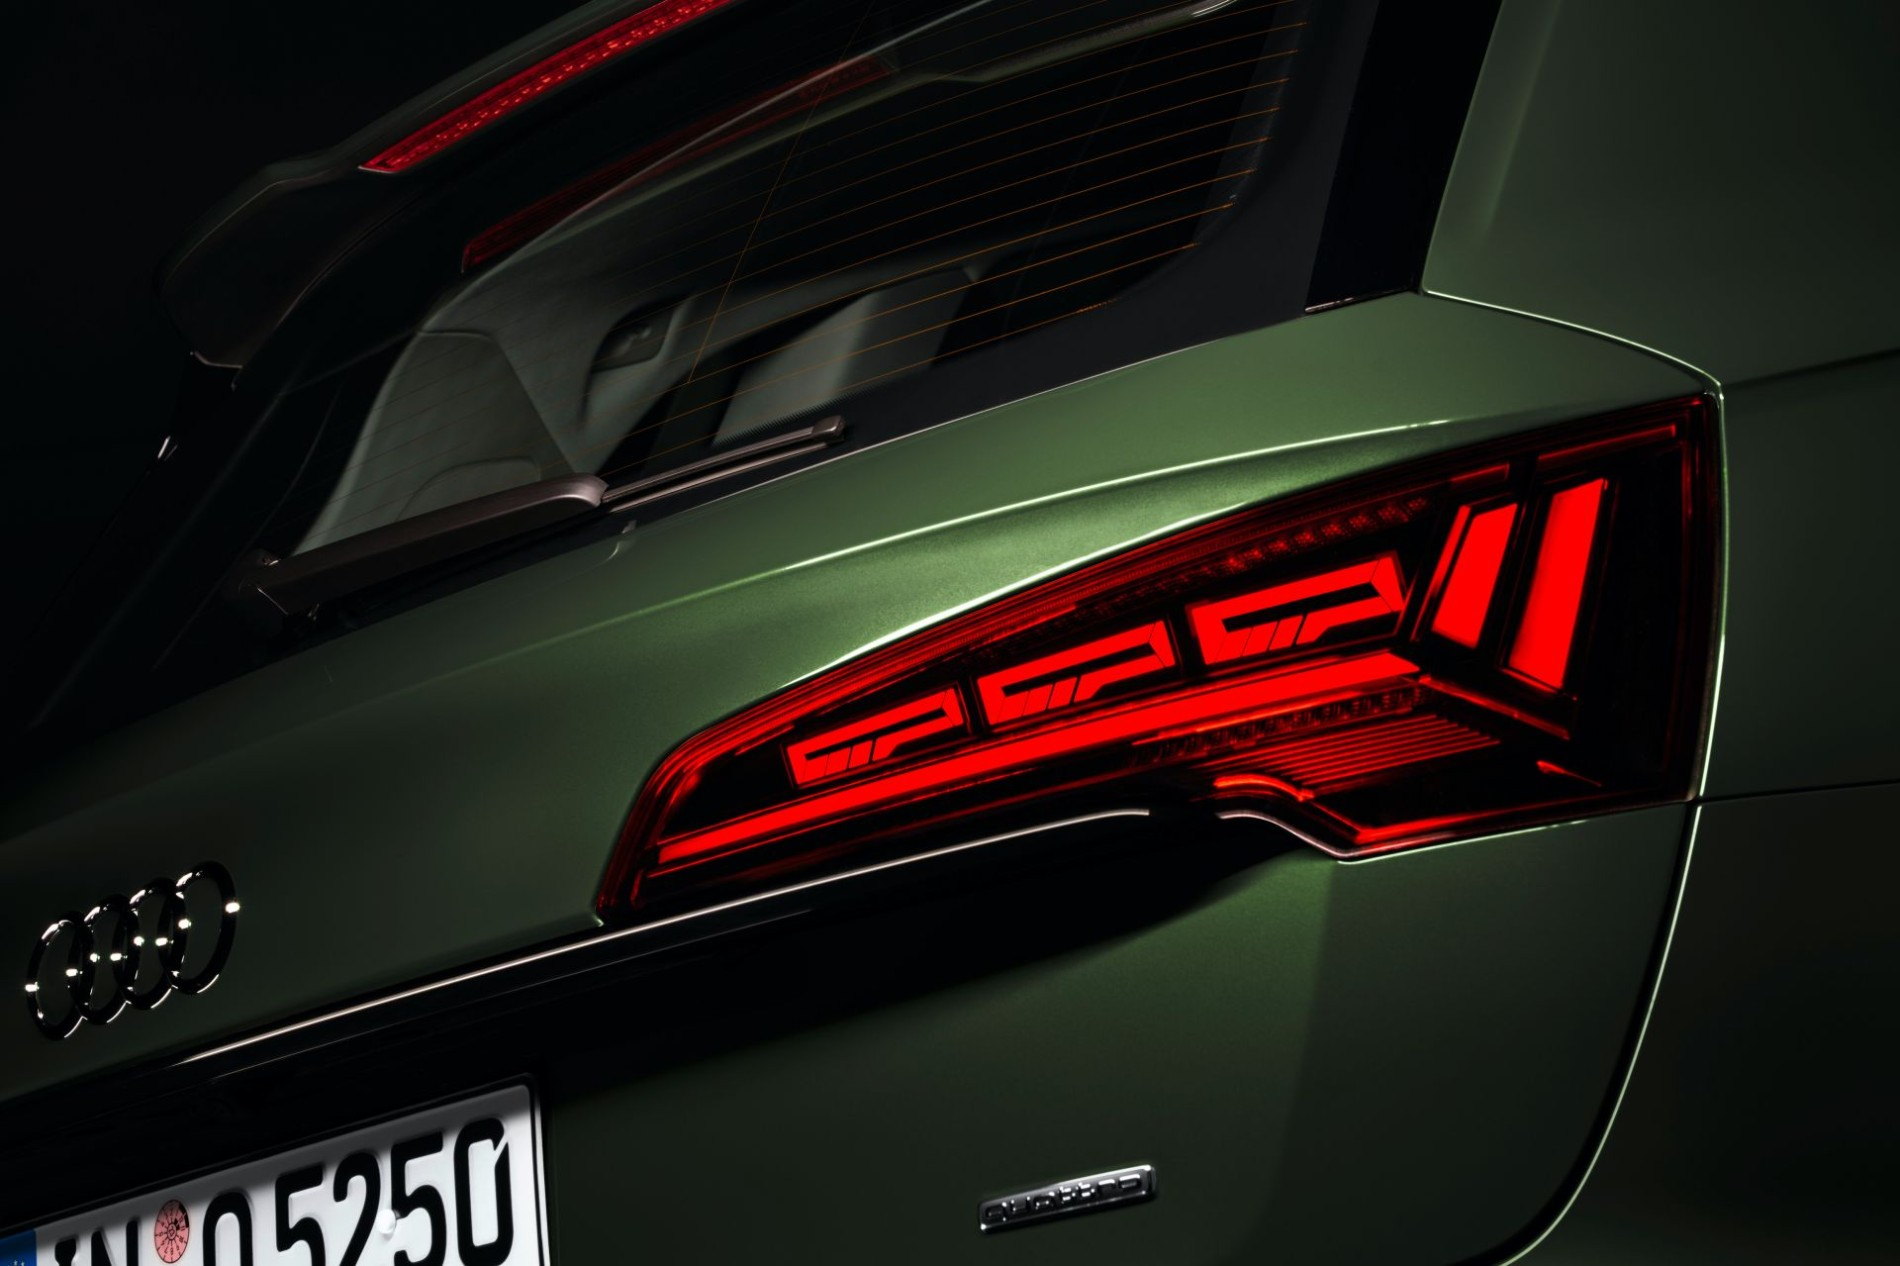 Audi Q5 facelift - Audi Q5 facelift